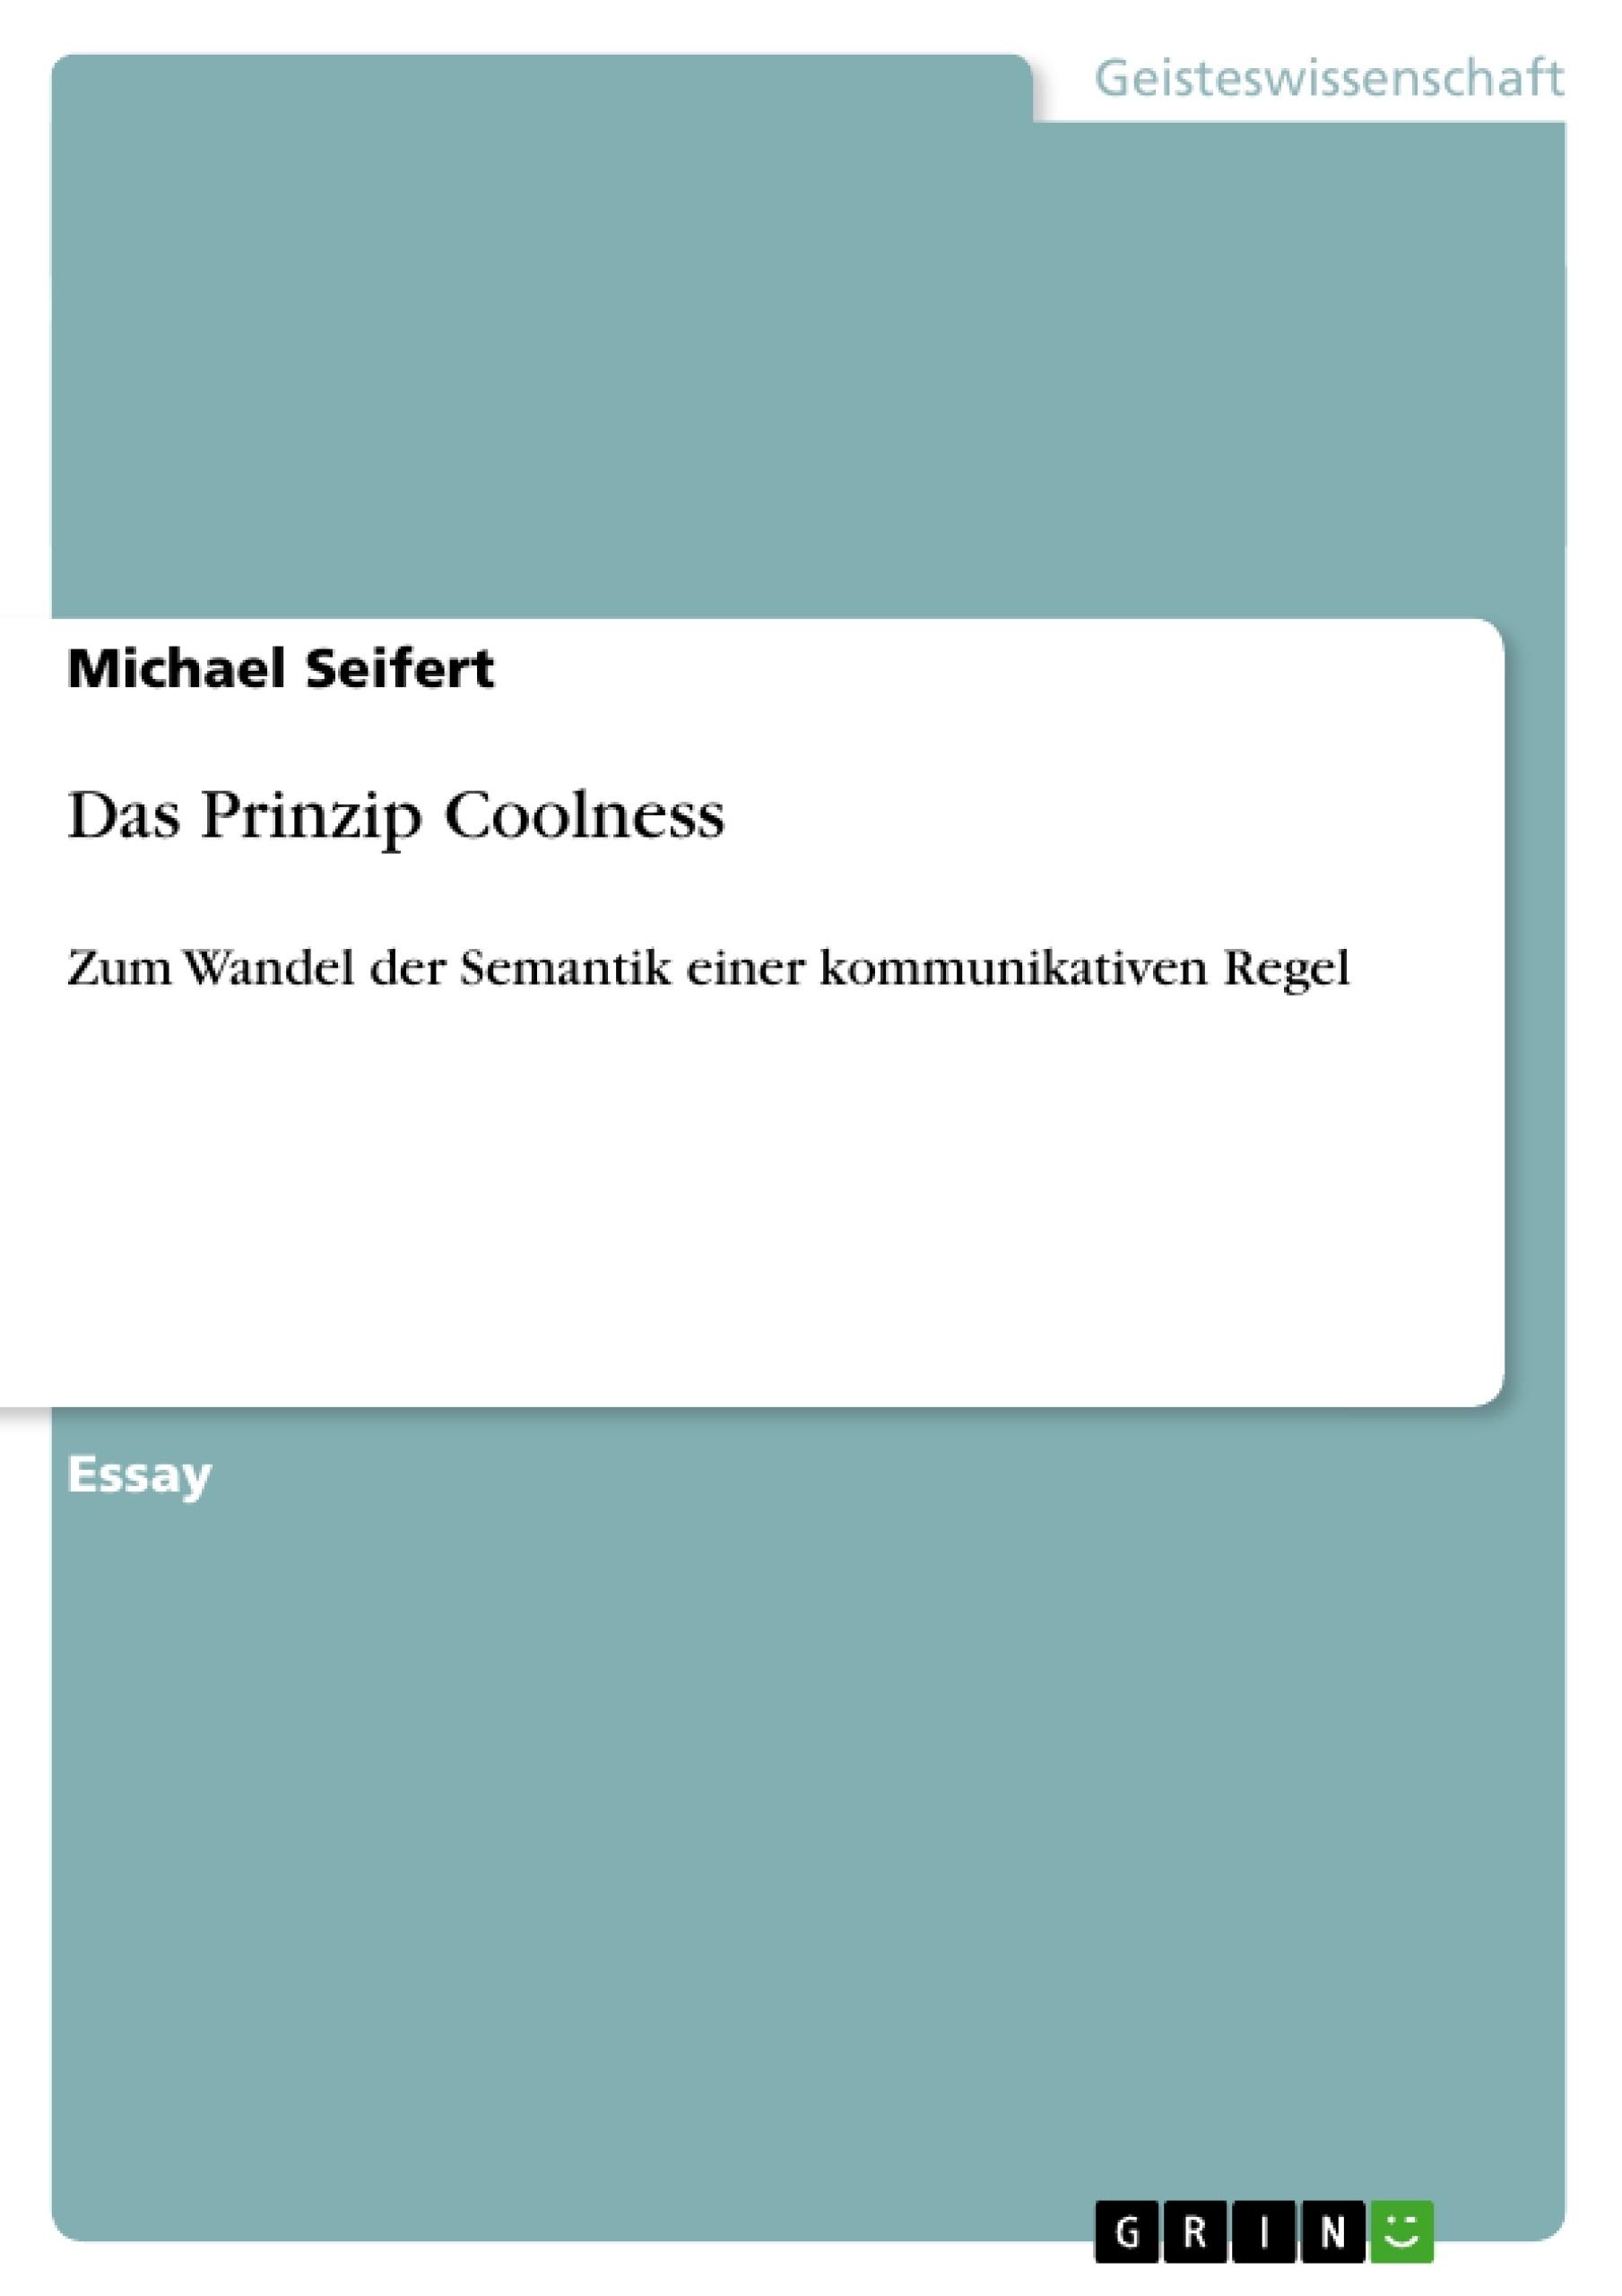 Titel: Das Prinzip Coolness